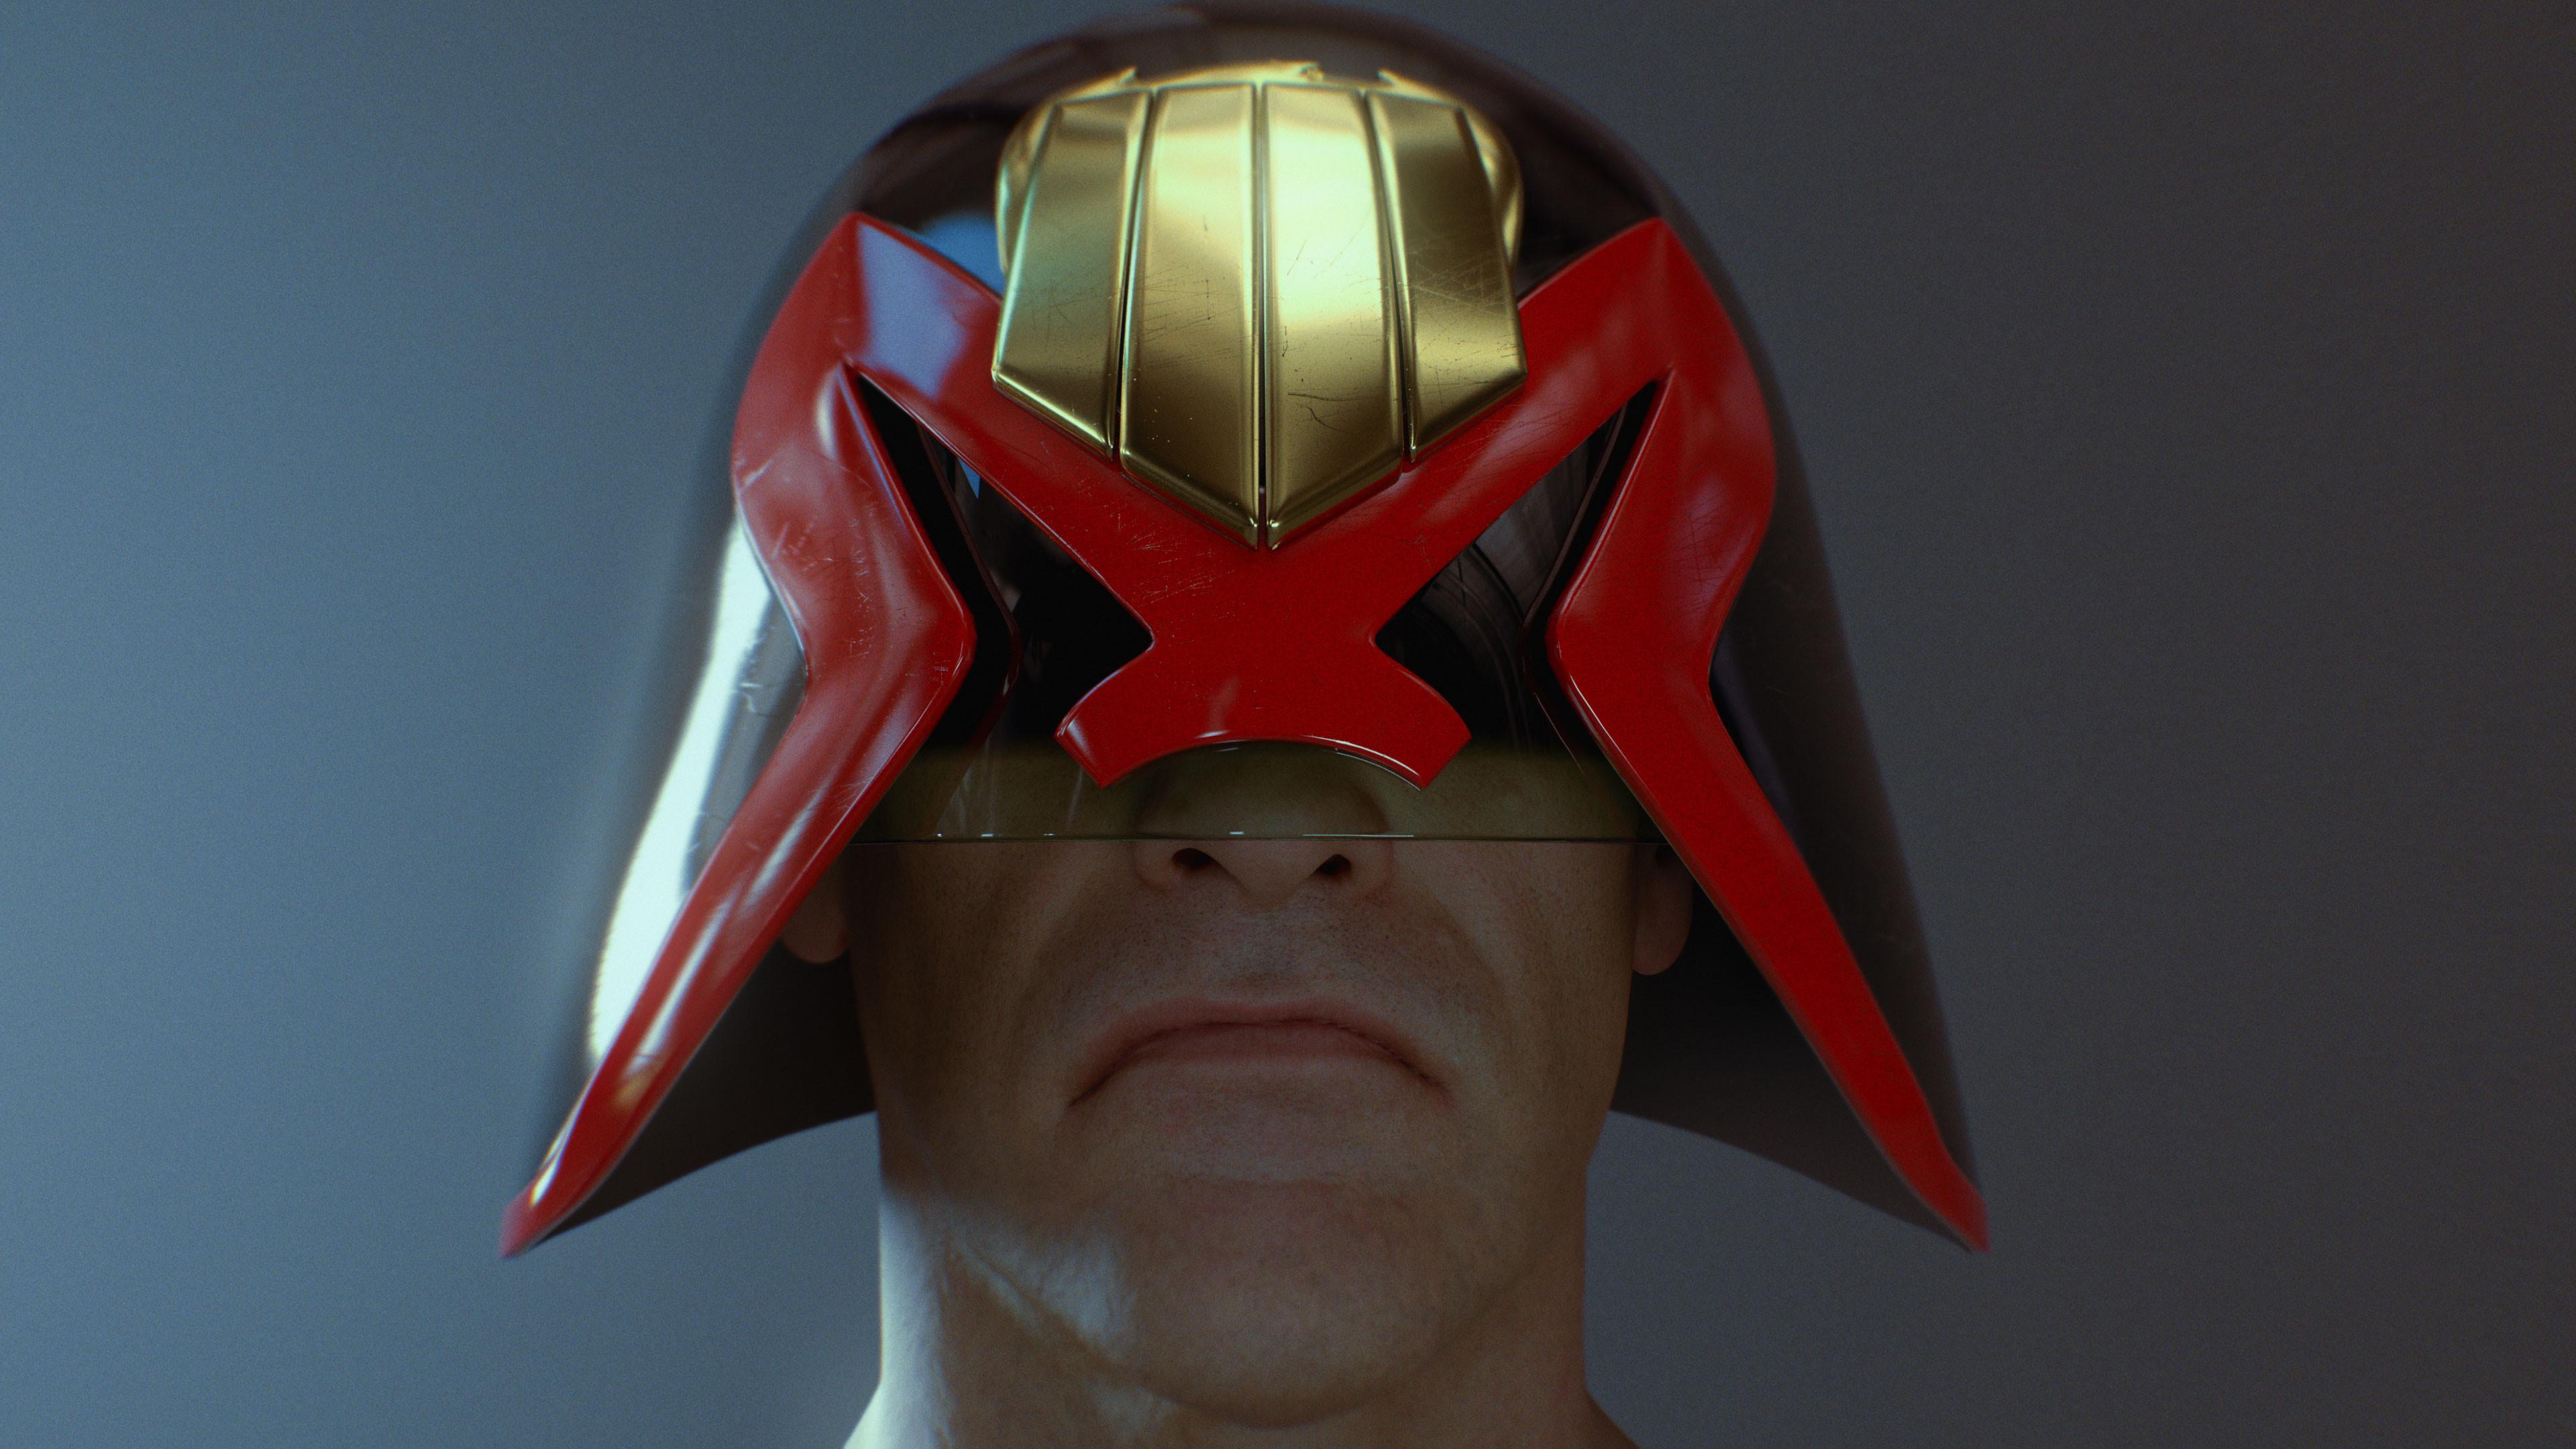 Judge Dredd Helmet based on a design by Brendan McCarthy (Head sculpt by Ten24)